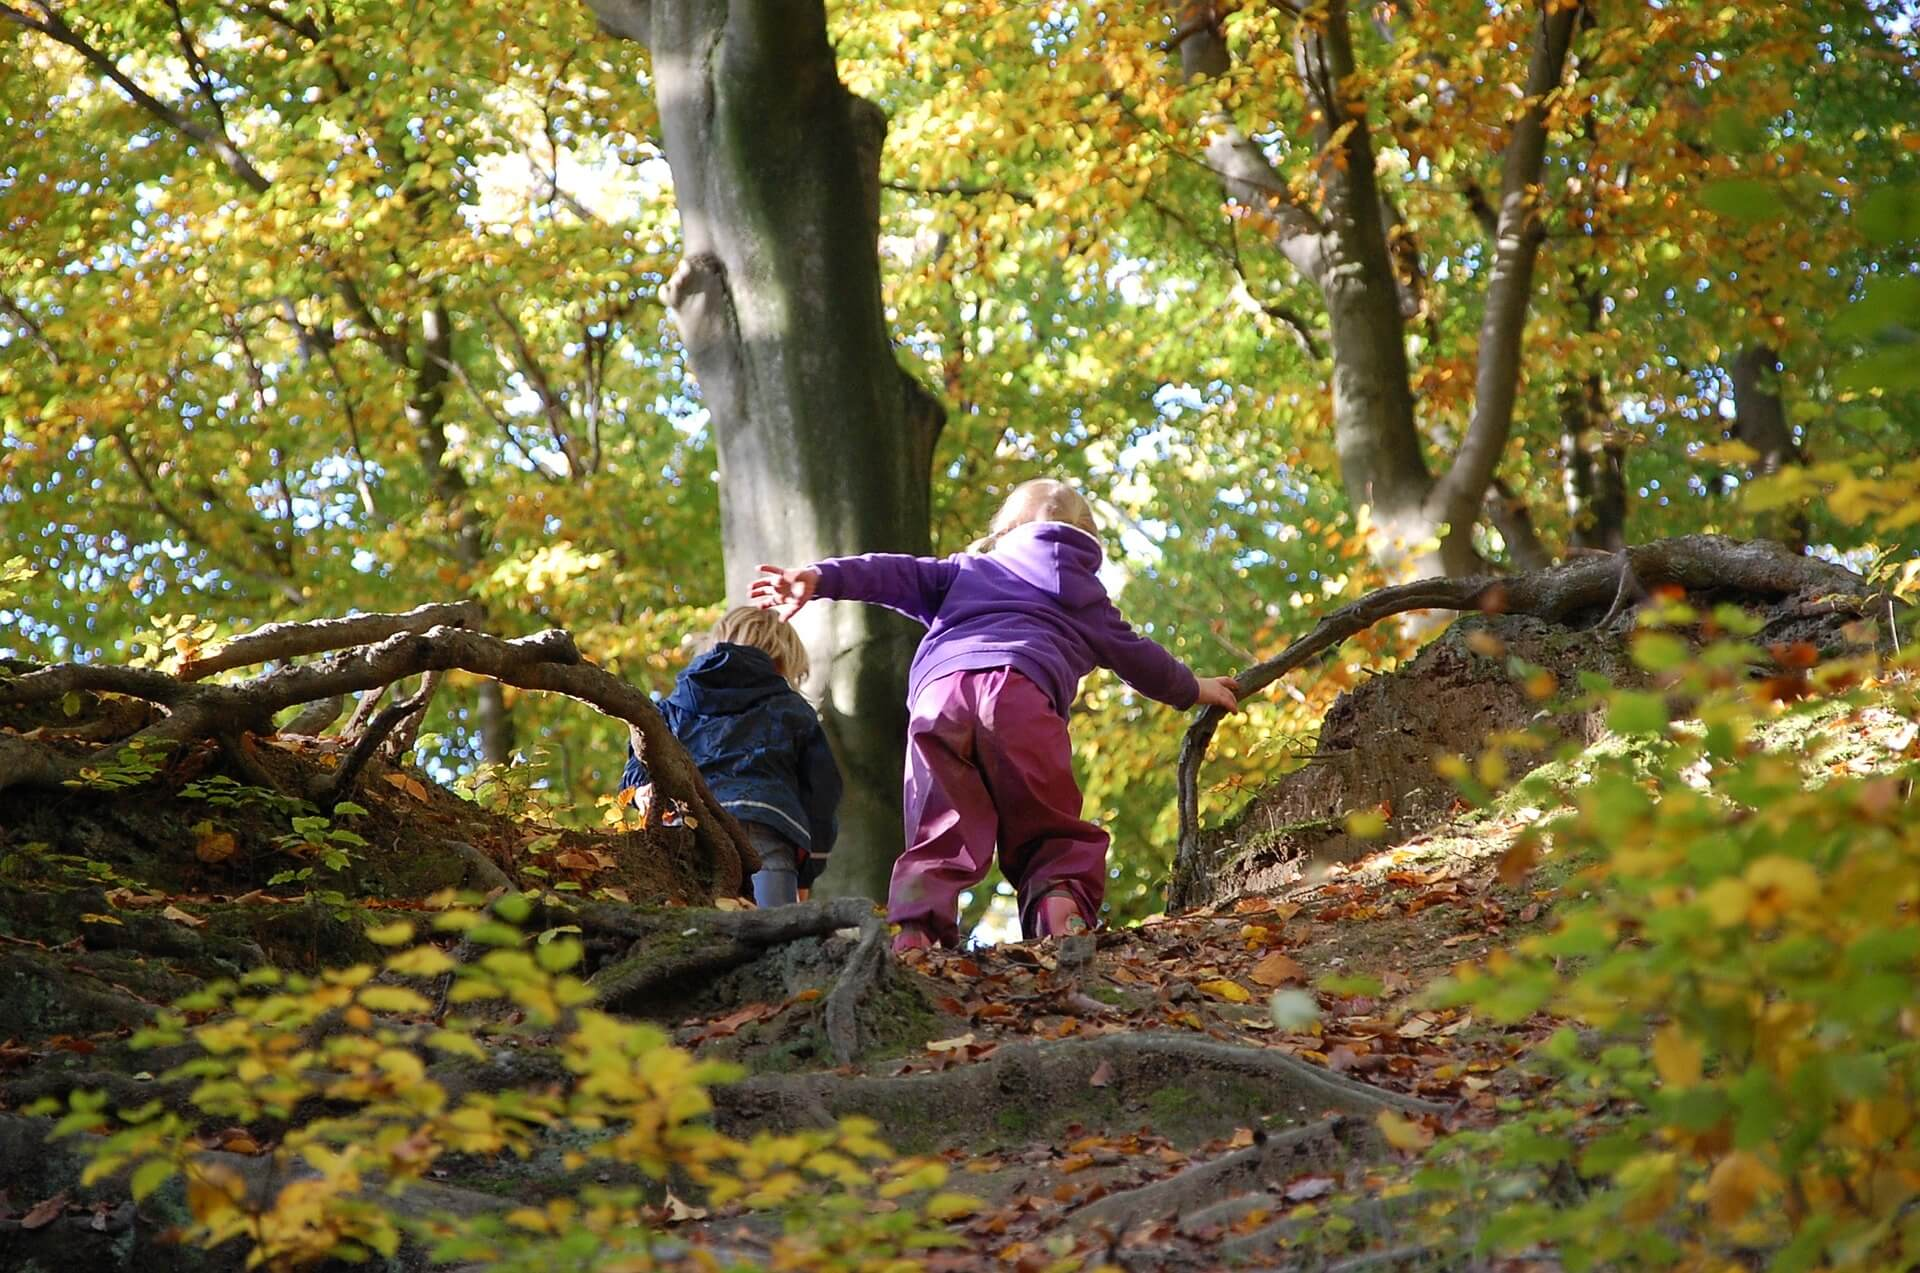 Waldkindergarten Naturkindergarten